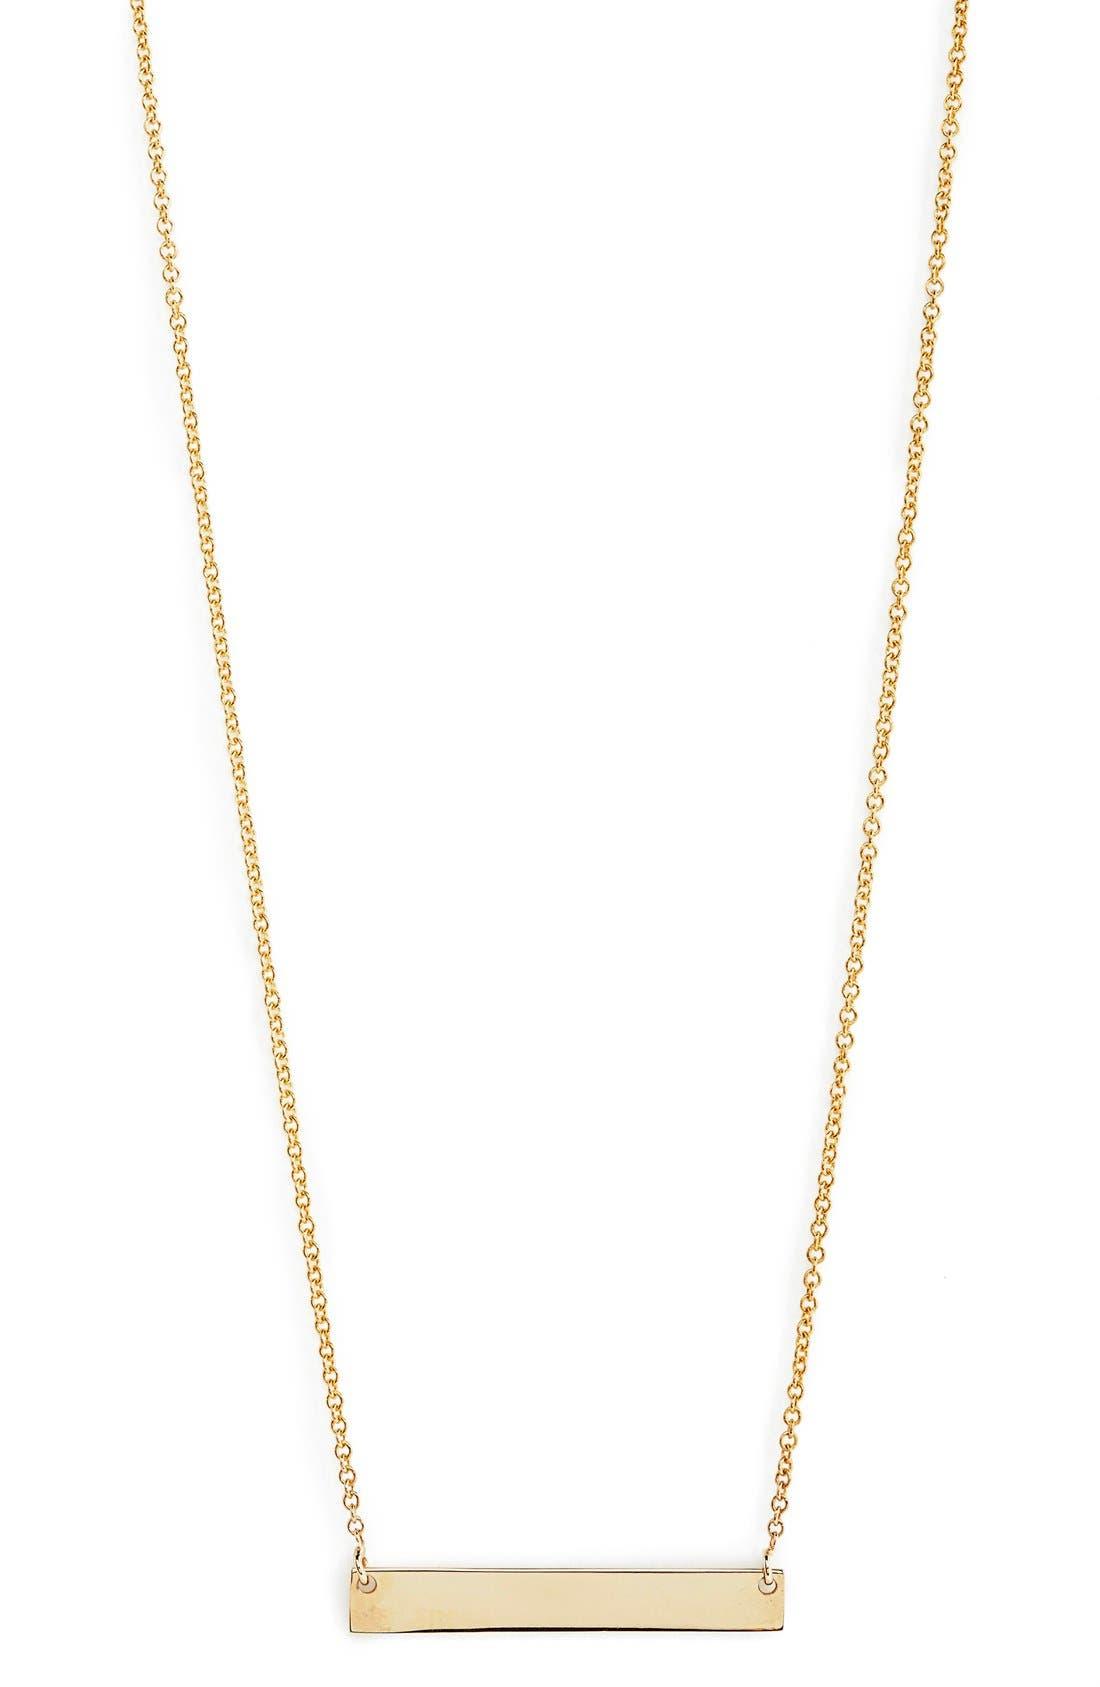 14k GoldBar Pendant Necklace,                             Main thumbnail 1, color,                             YELLOW GOLD